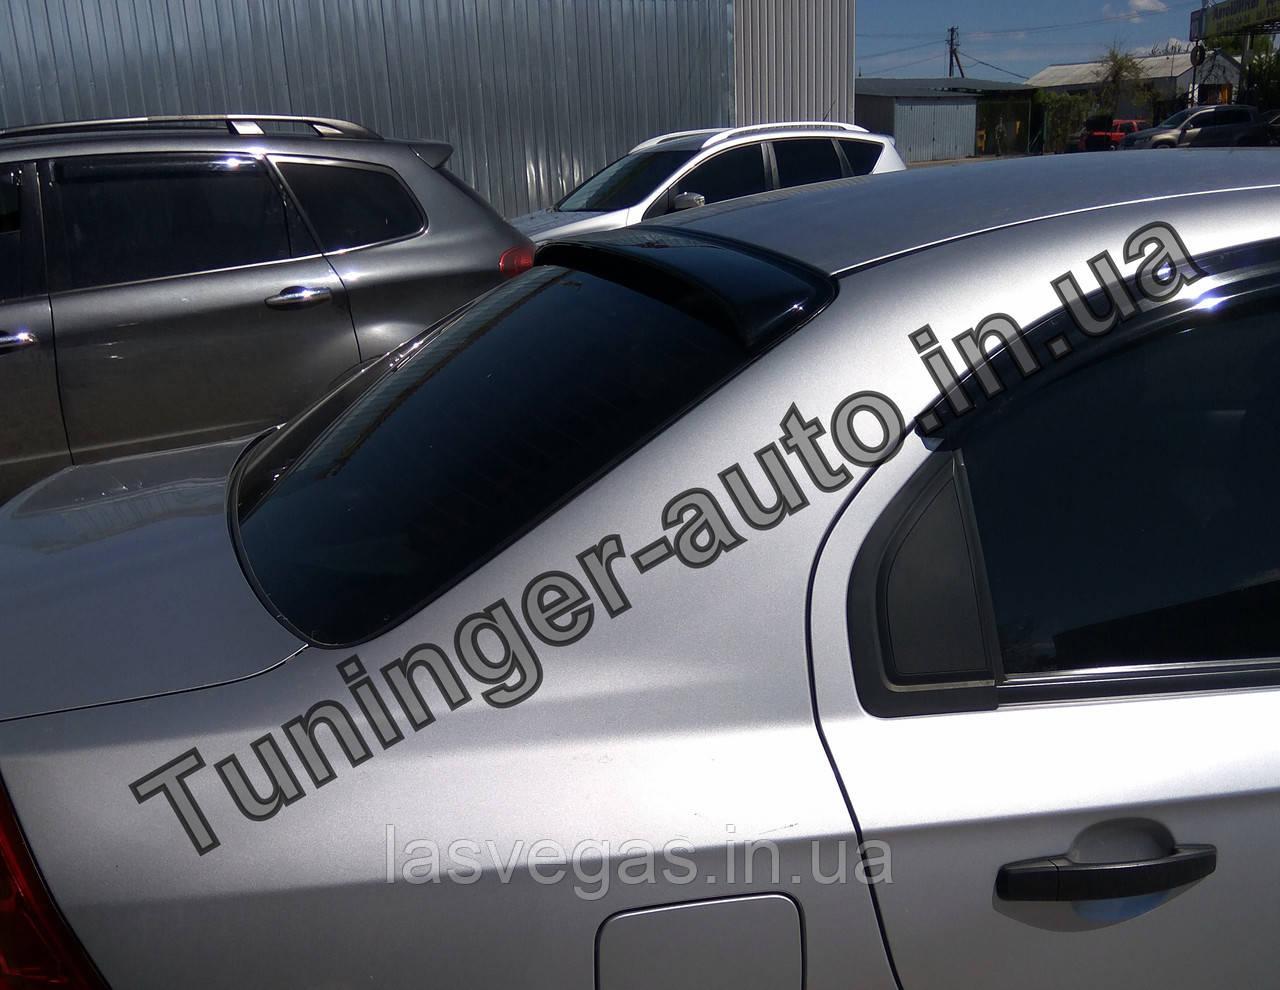 Козирок-спойлер - заднього скла (дефлектор) Chevrolet Aveo 1-3 sed. (ANV)